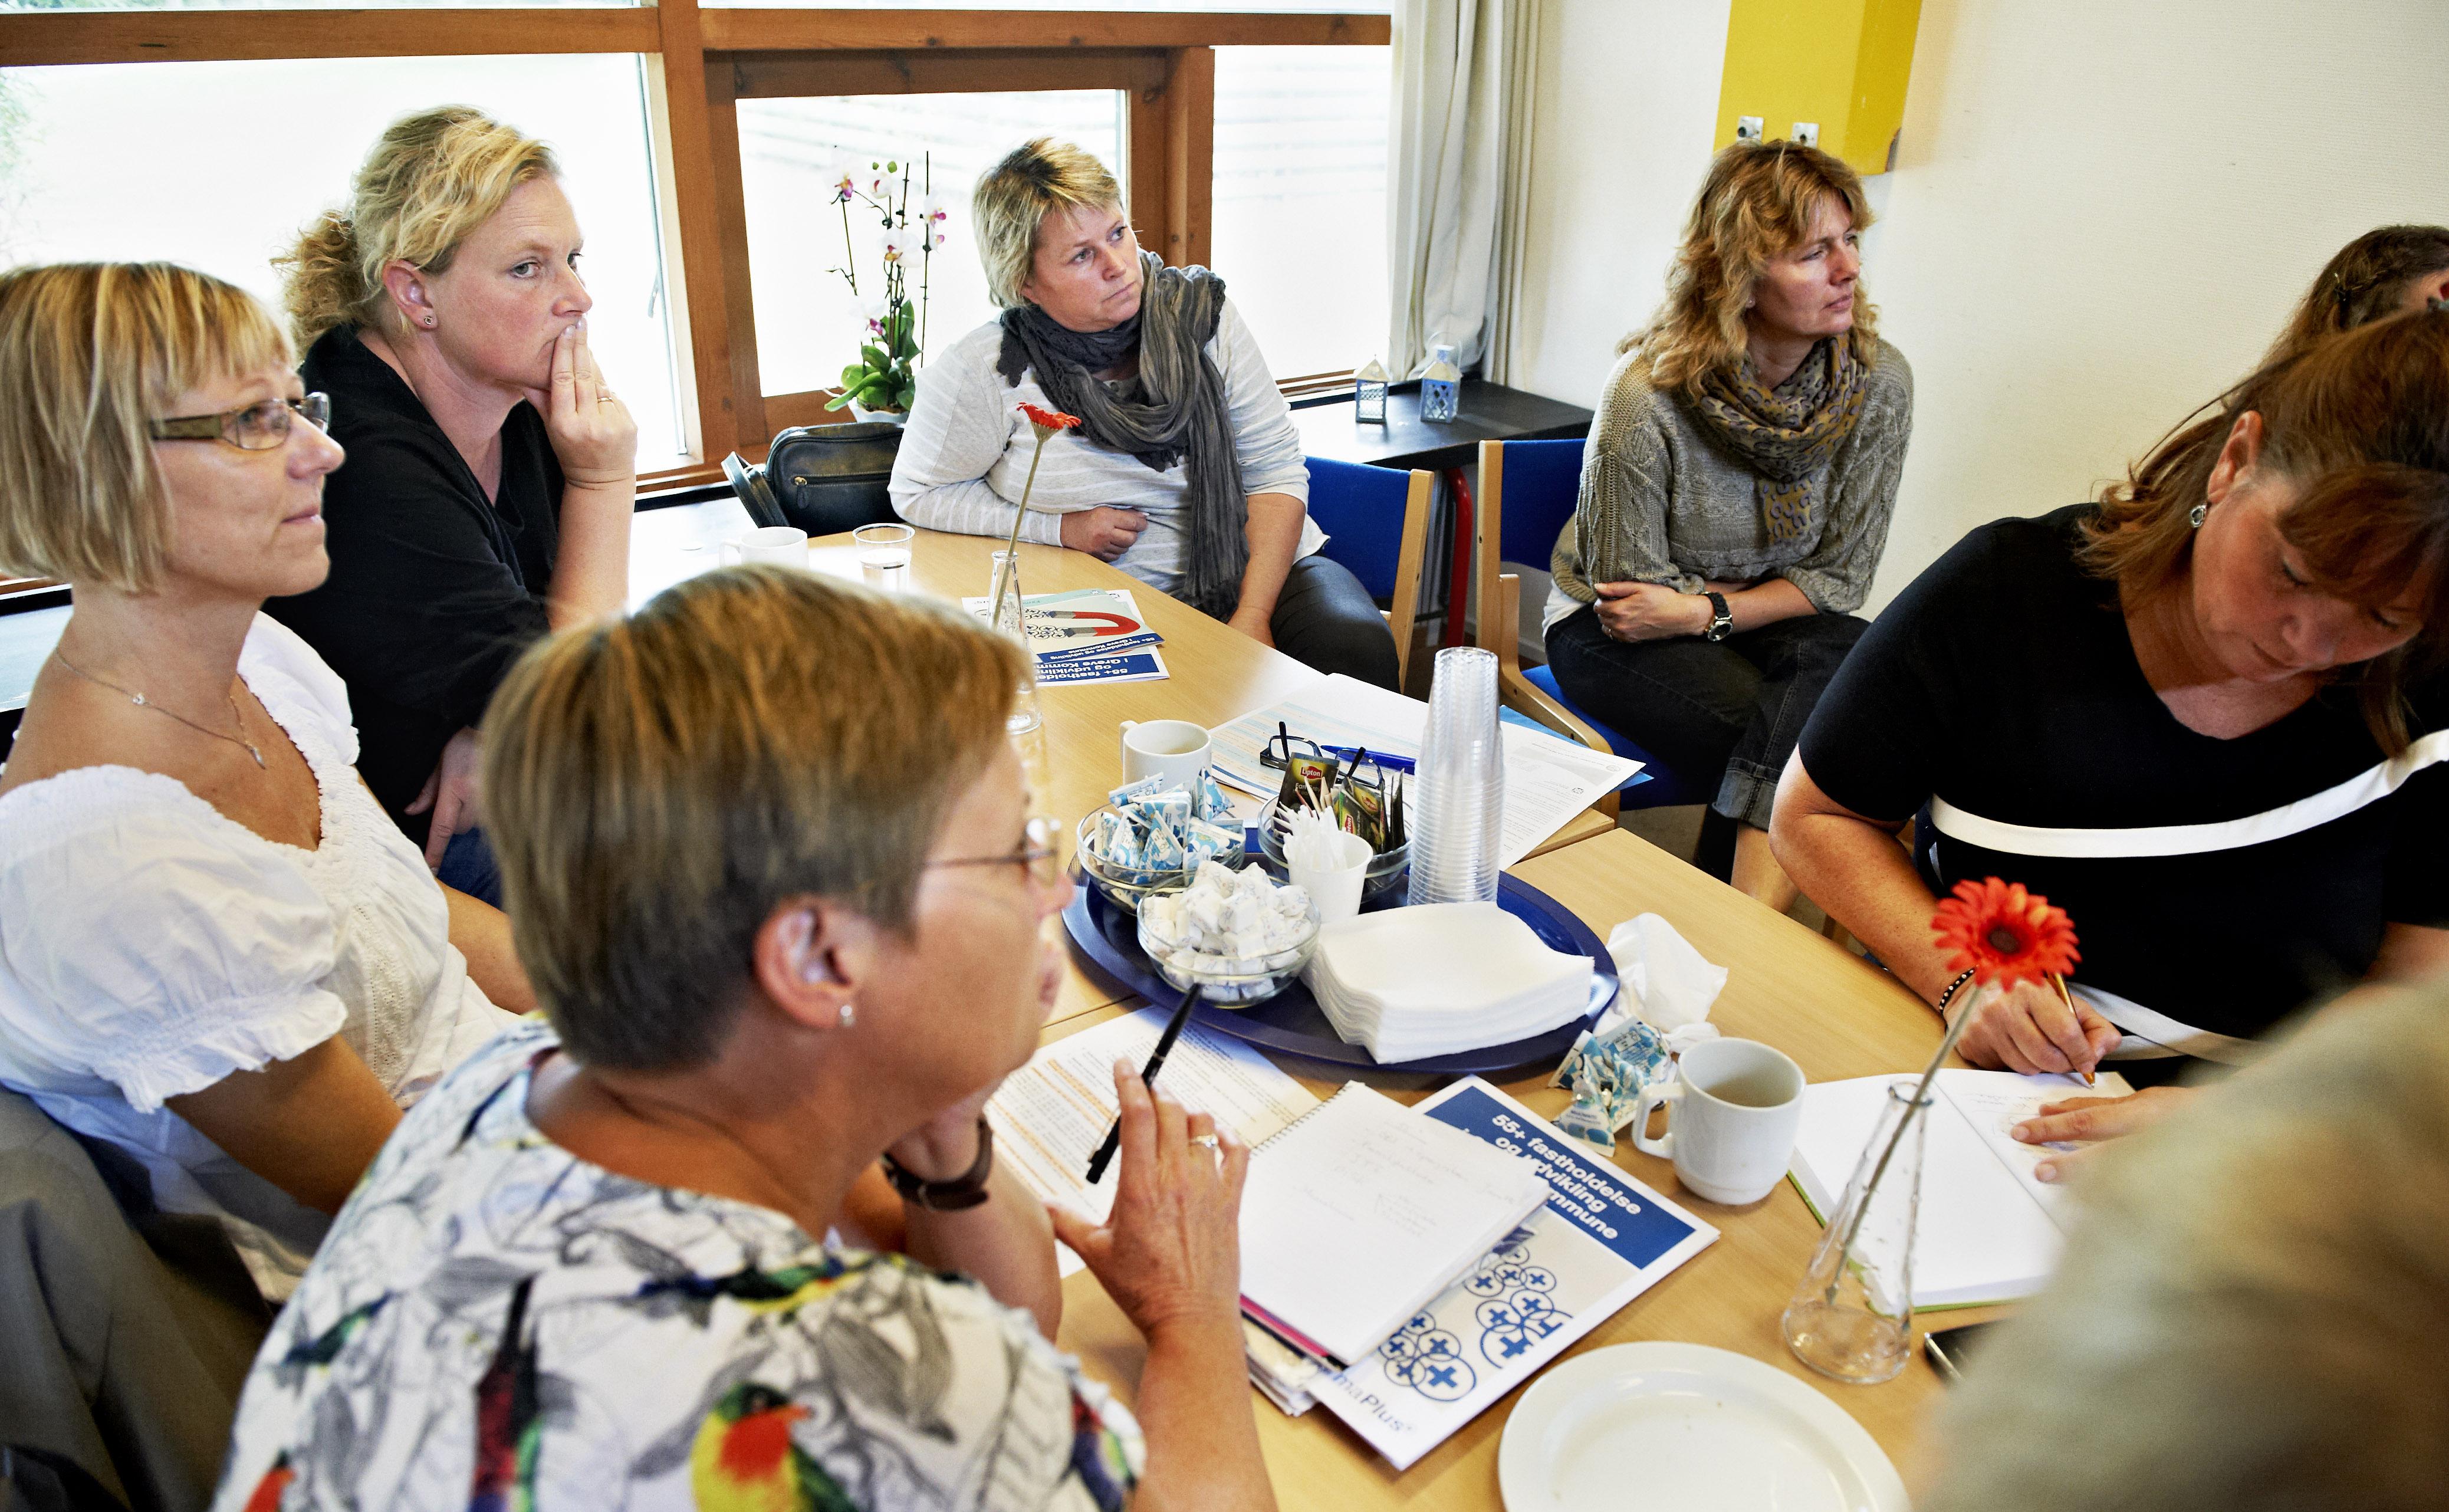 Kommunikations kursus for ledere